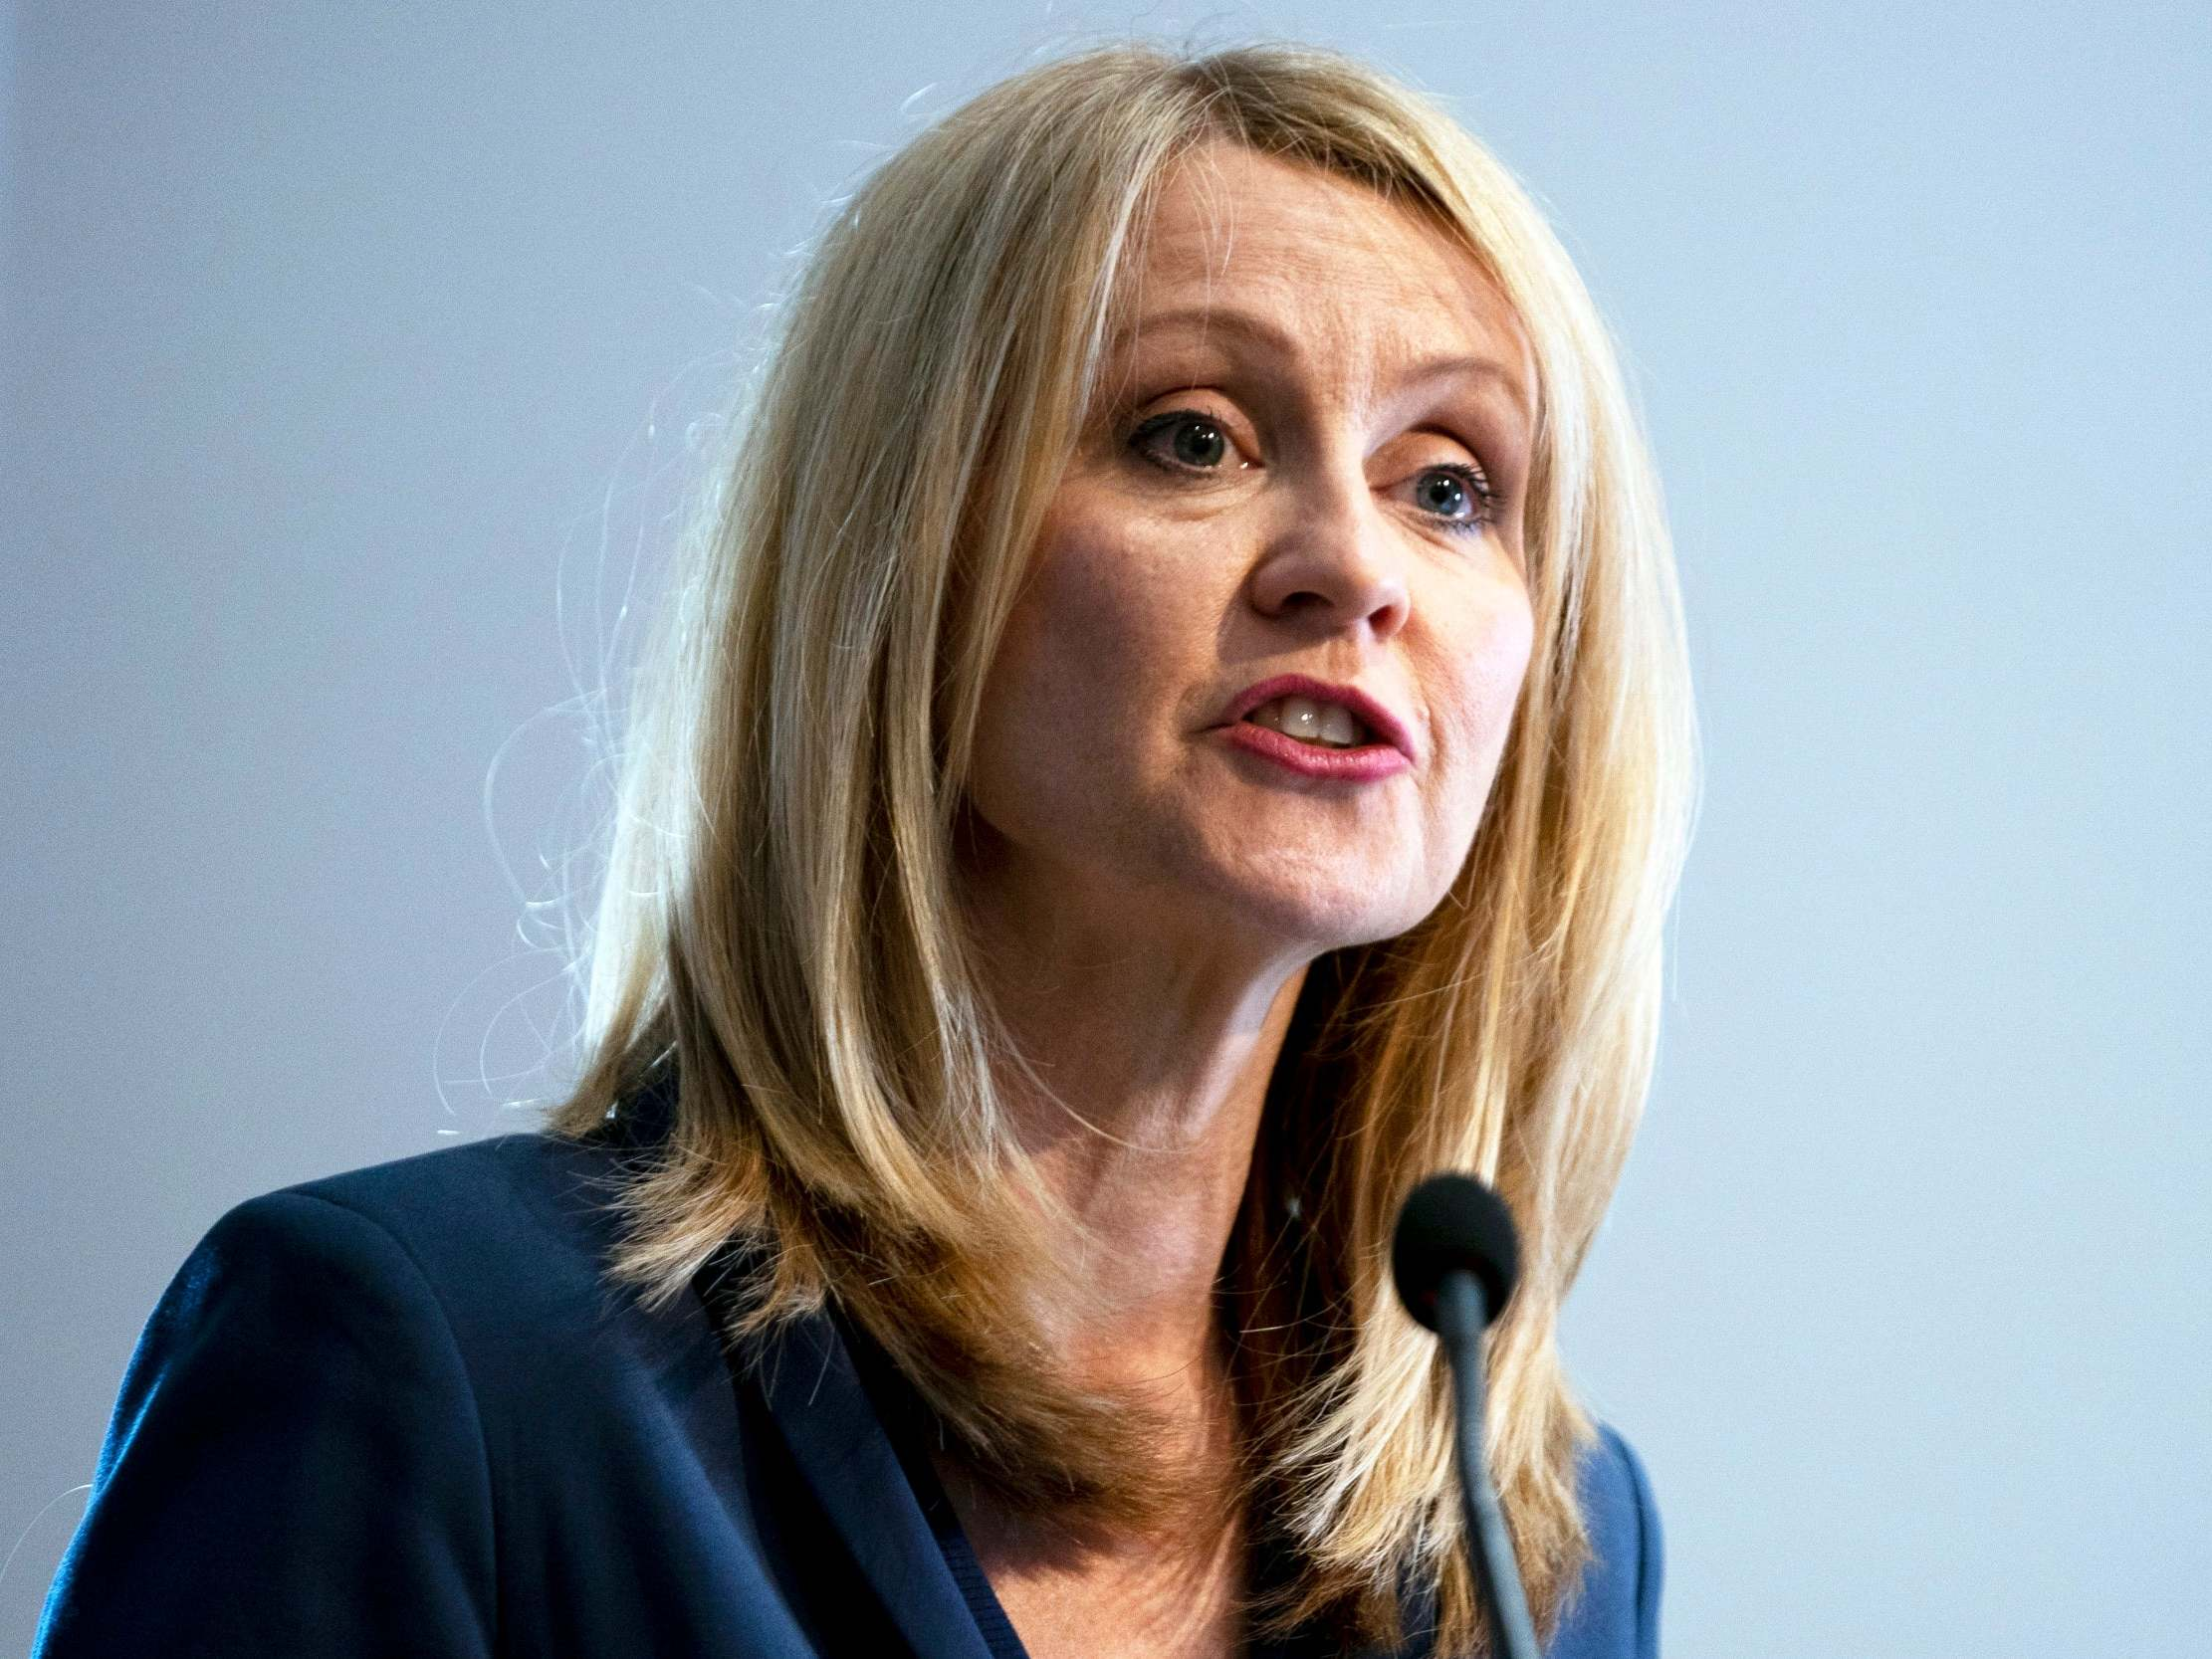 Esther McVey announces support for Boris Johnson in Tory leadership race